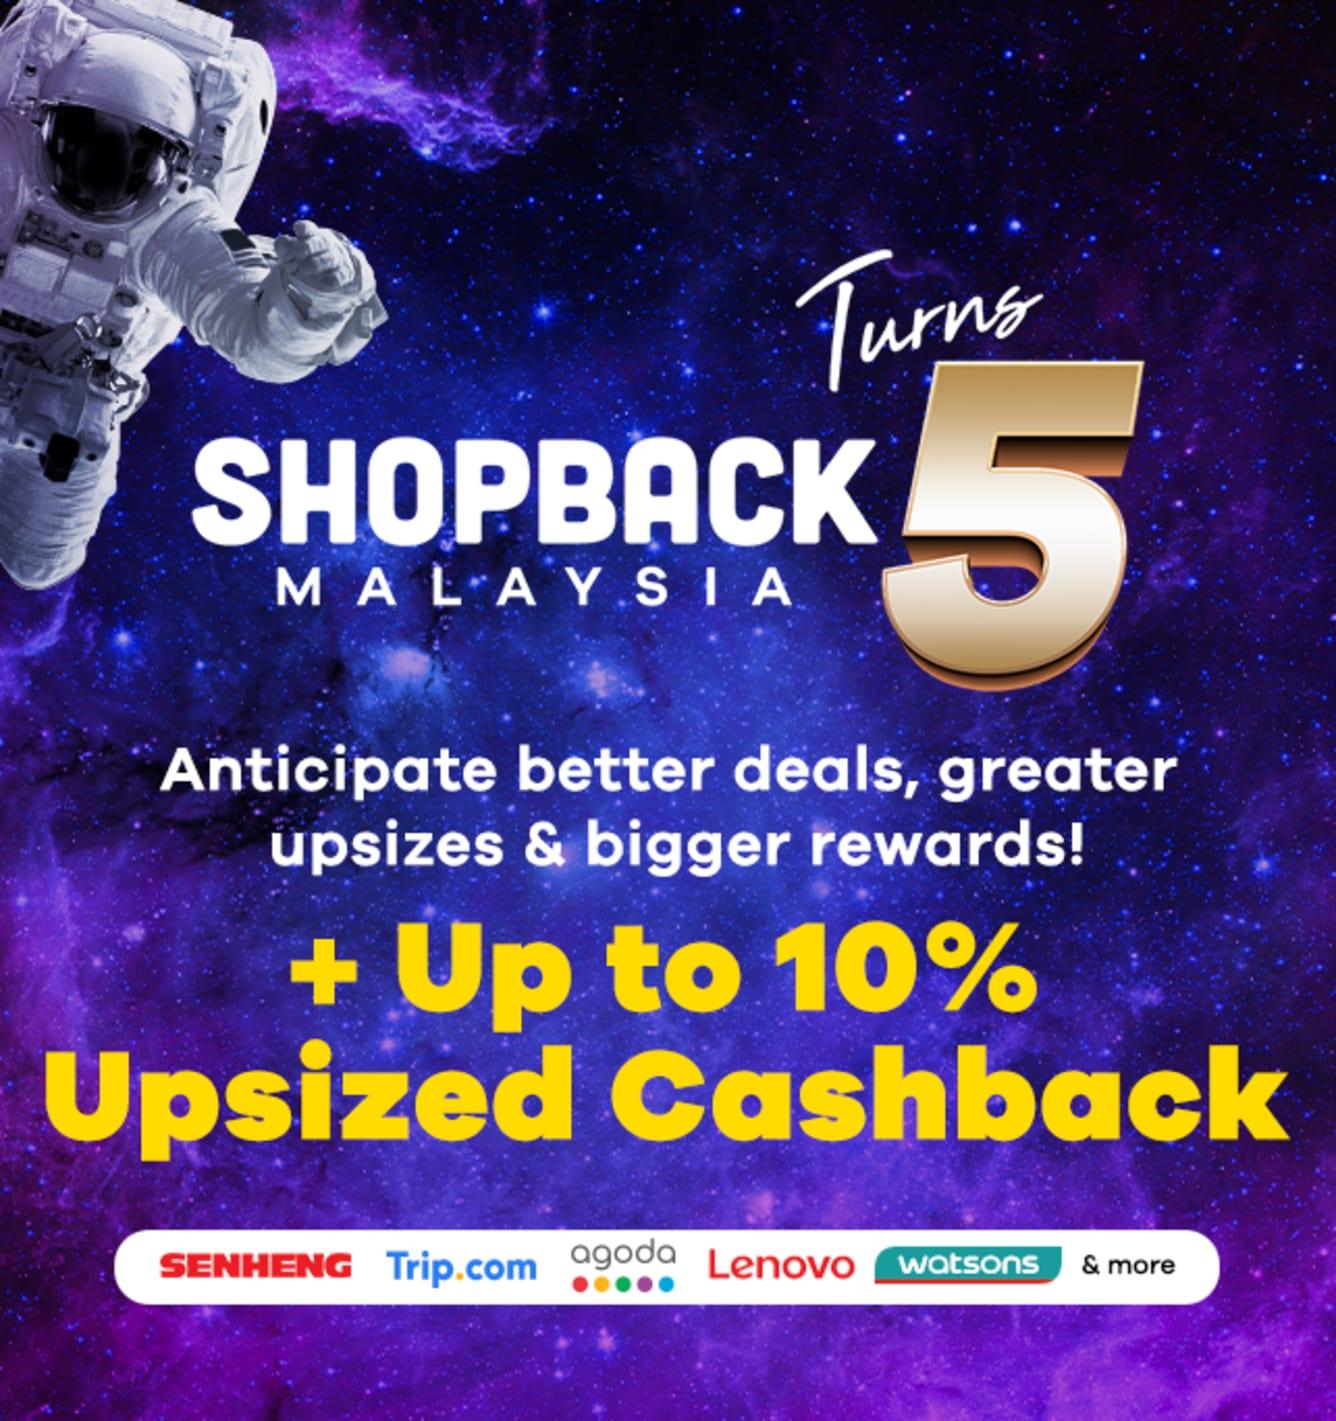 ShopBack Birthday February 2020 Up To 10%